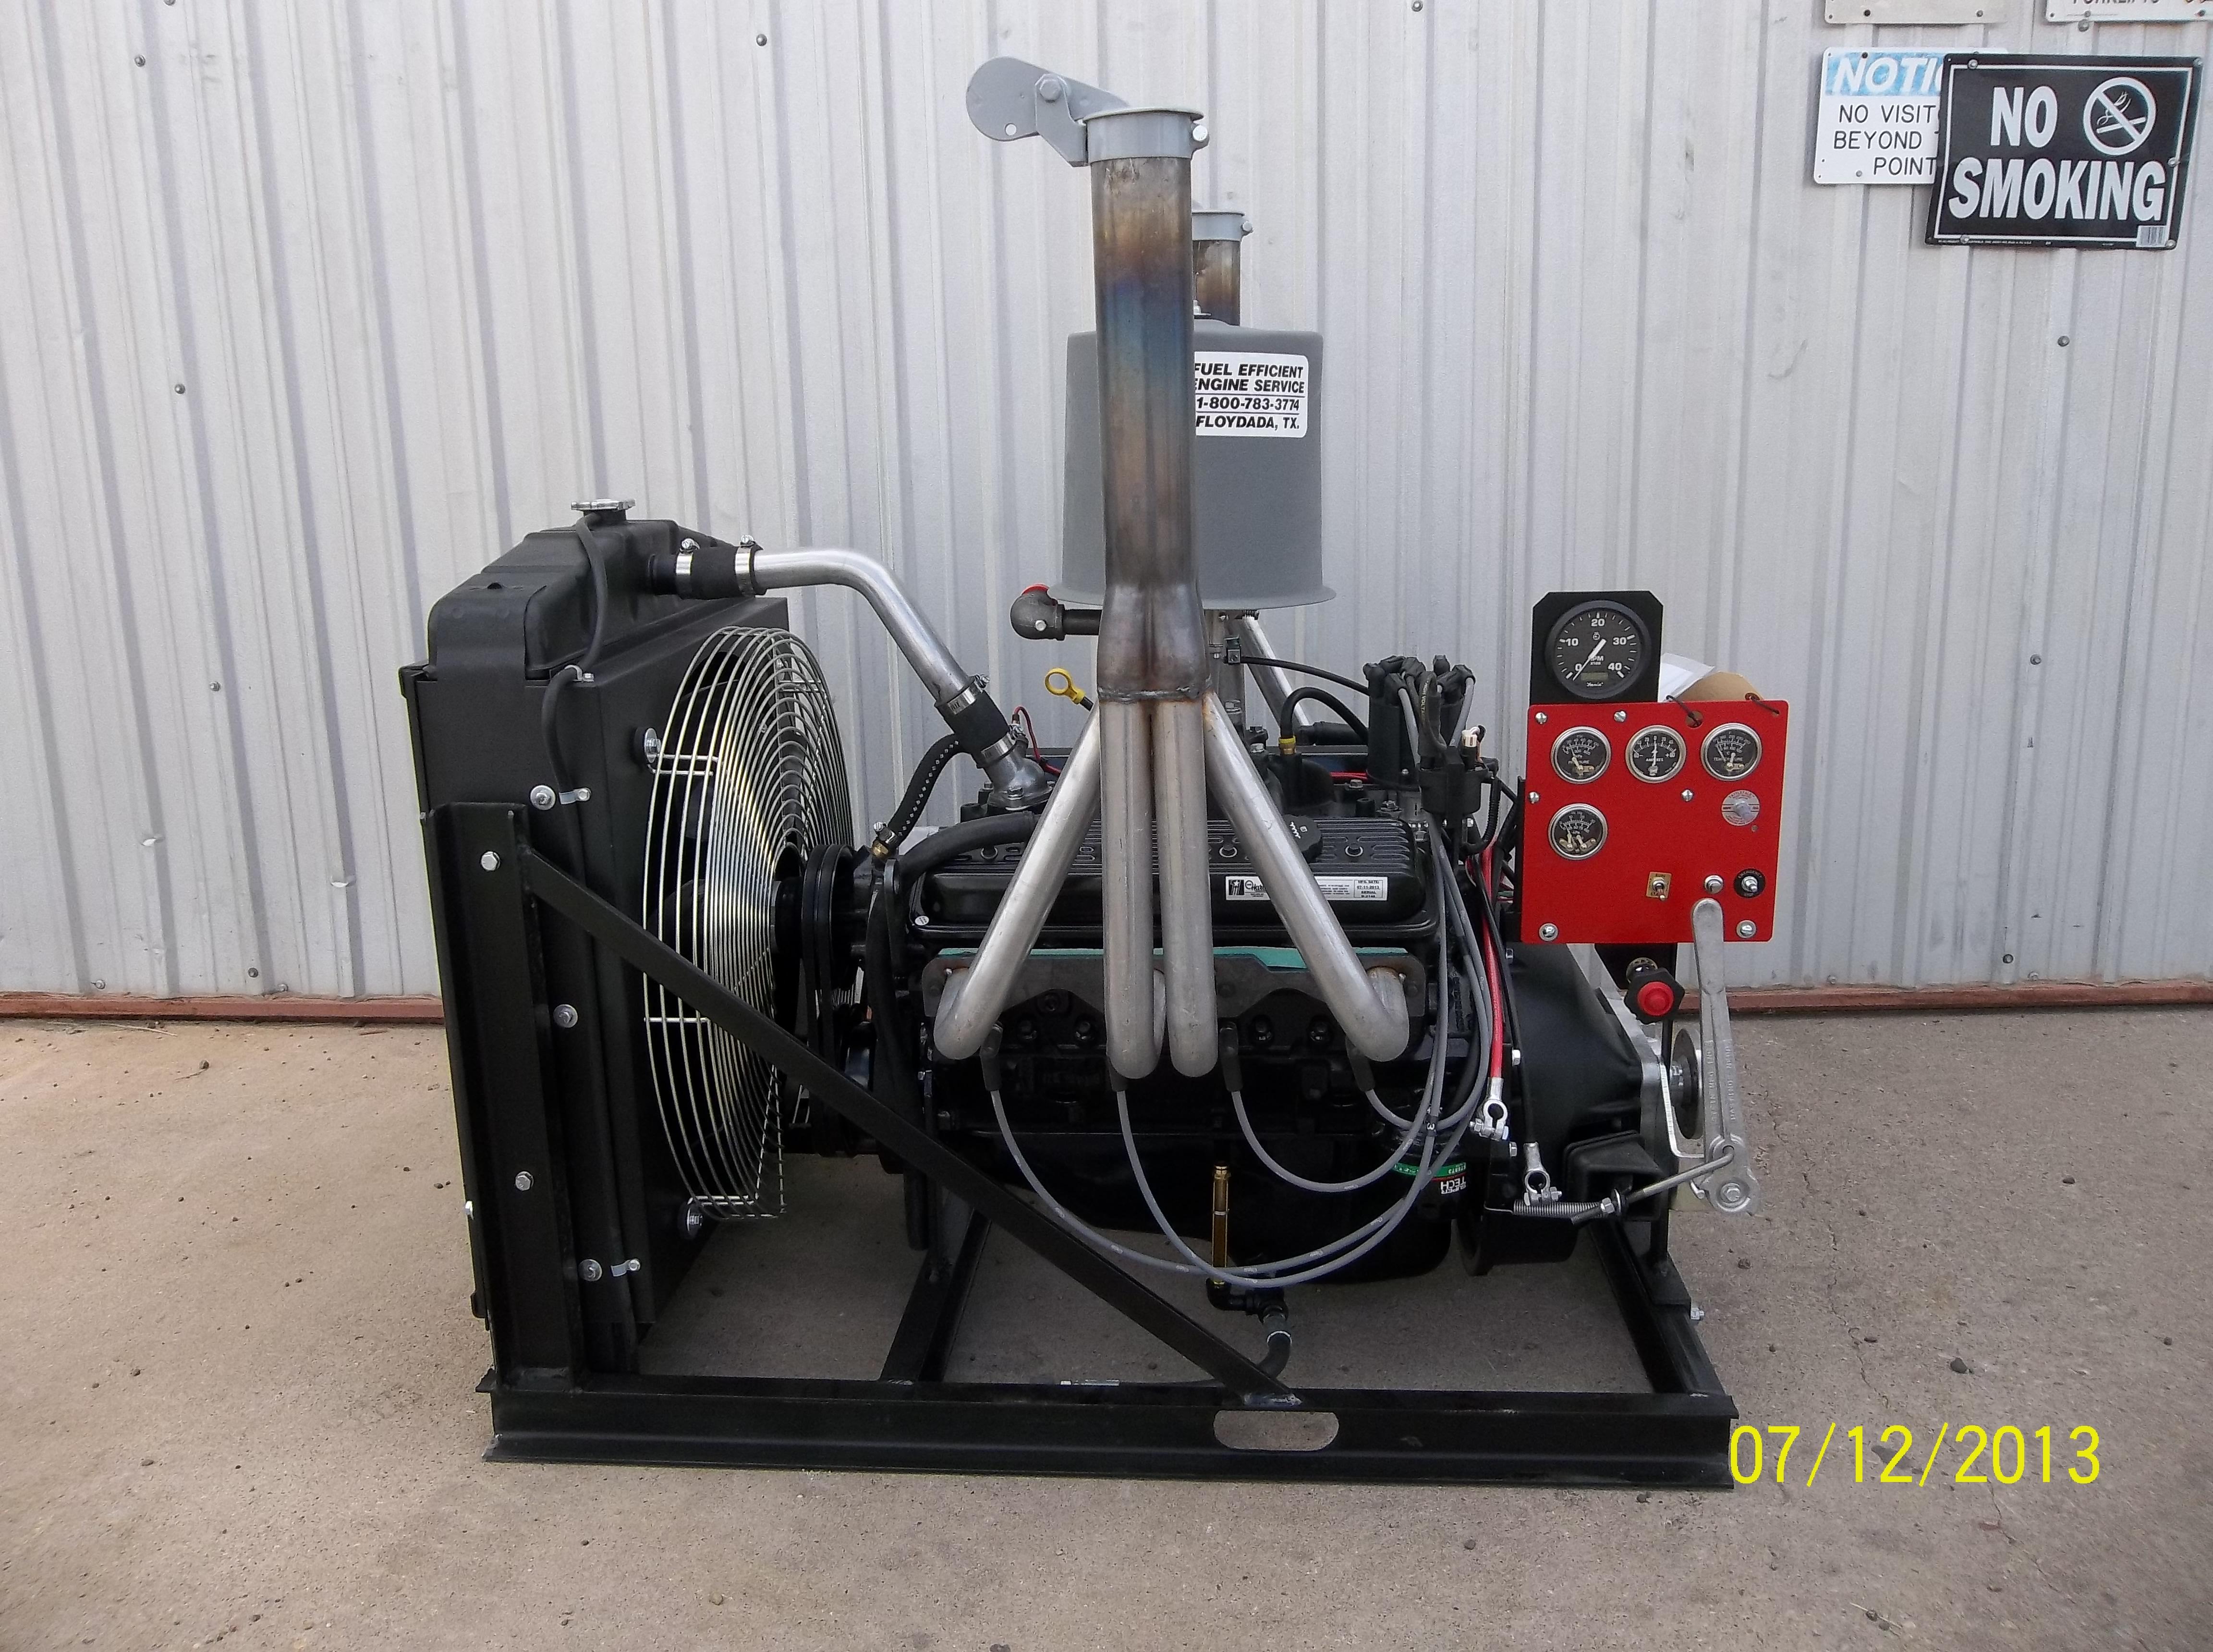 Don Hardy Fuel Efficient Engines Gm 8 1 Liter Engine 350 Ptoradiator 3106899 Bytes 57l Chevrolet